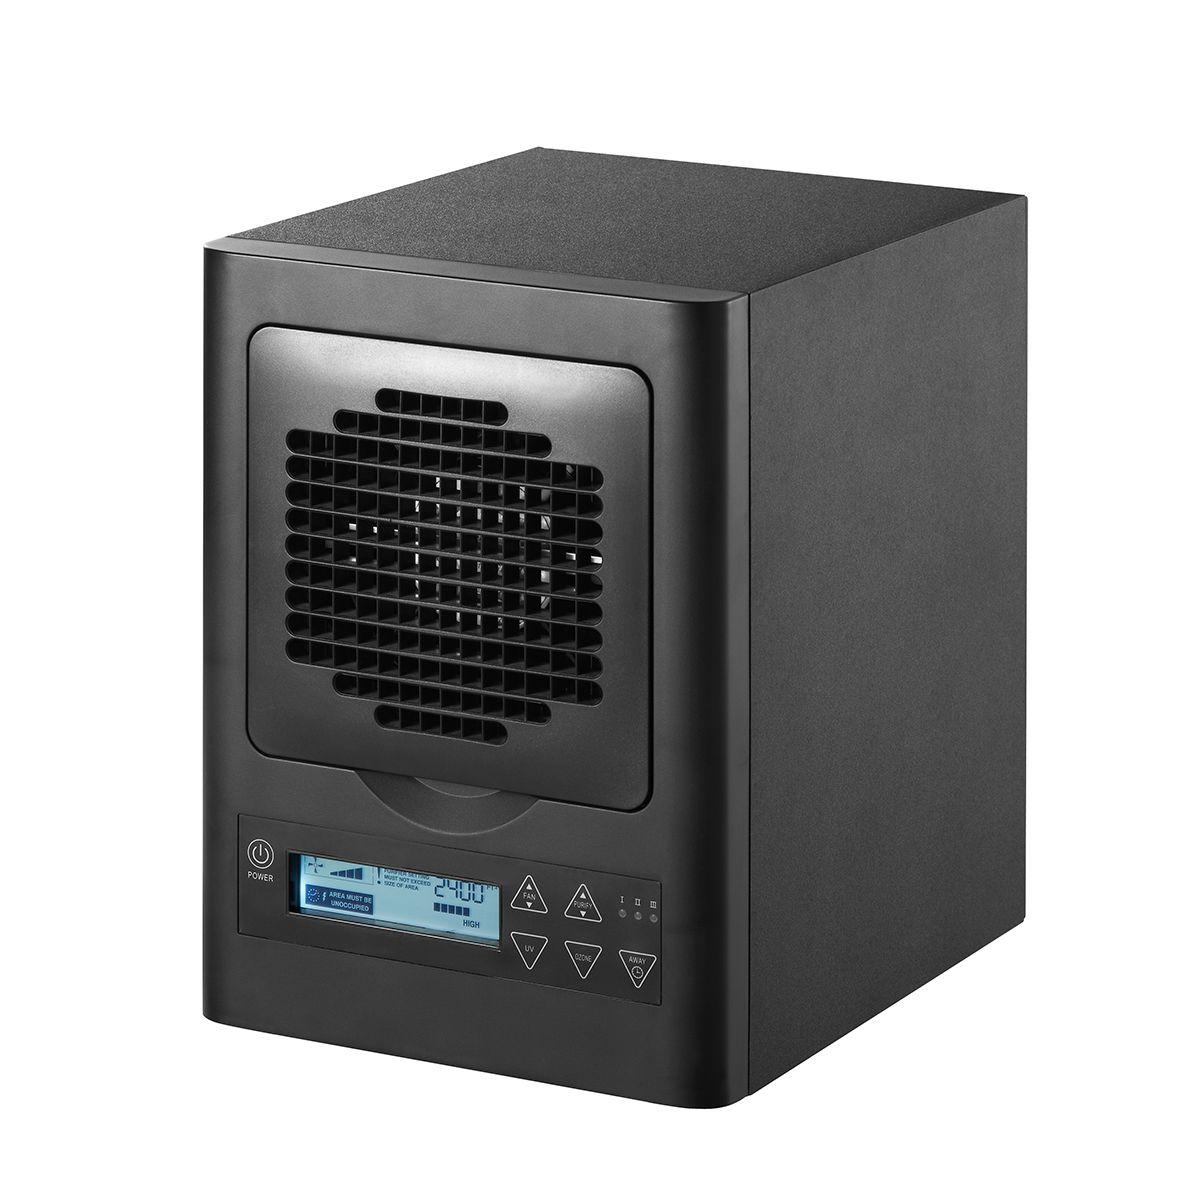 Breeze 2 Air Purifier Air purifier, Variable speed motor